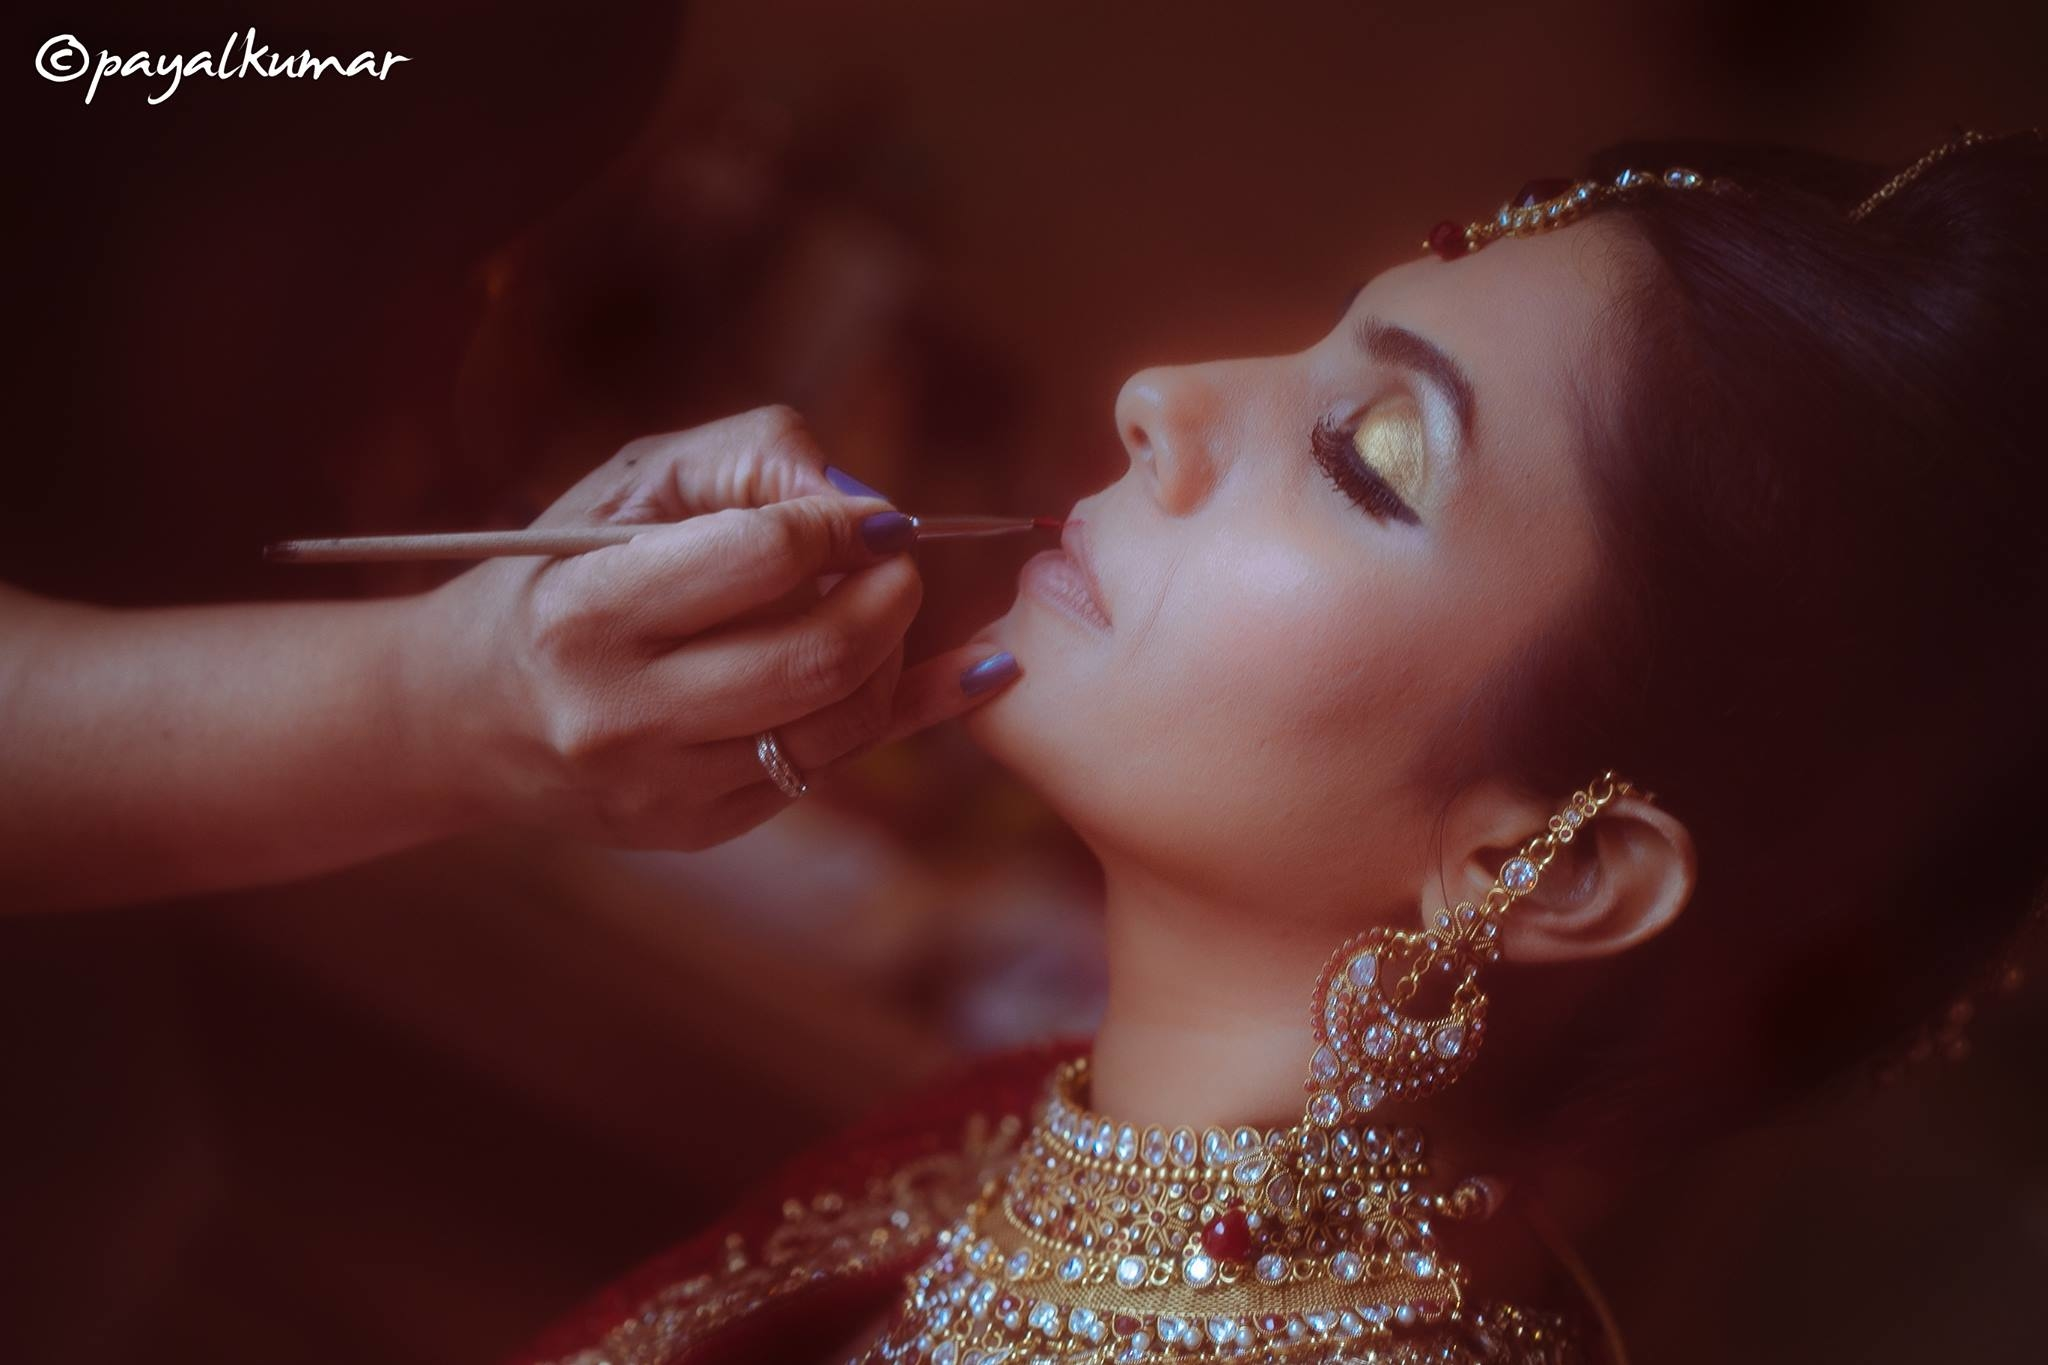 Payal Kumar Photography